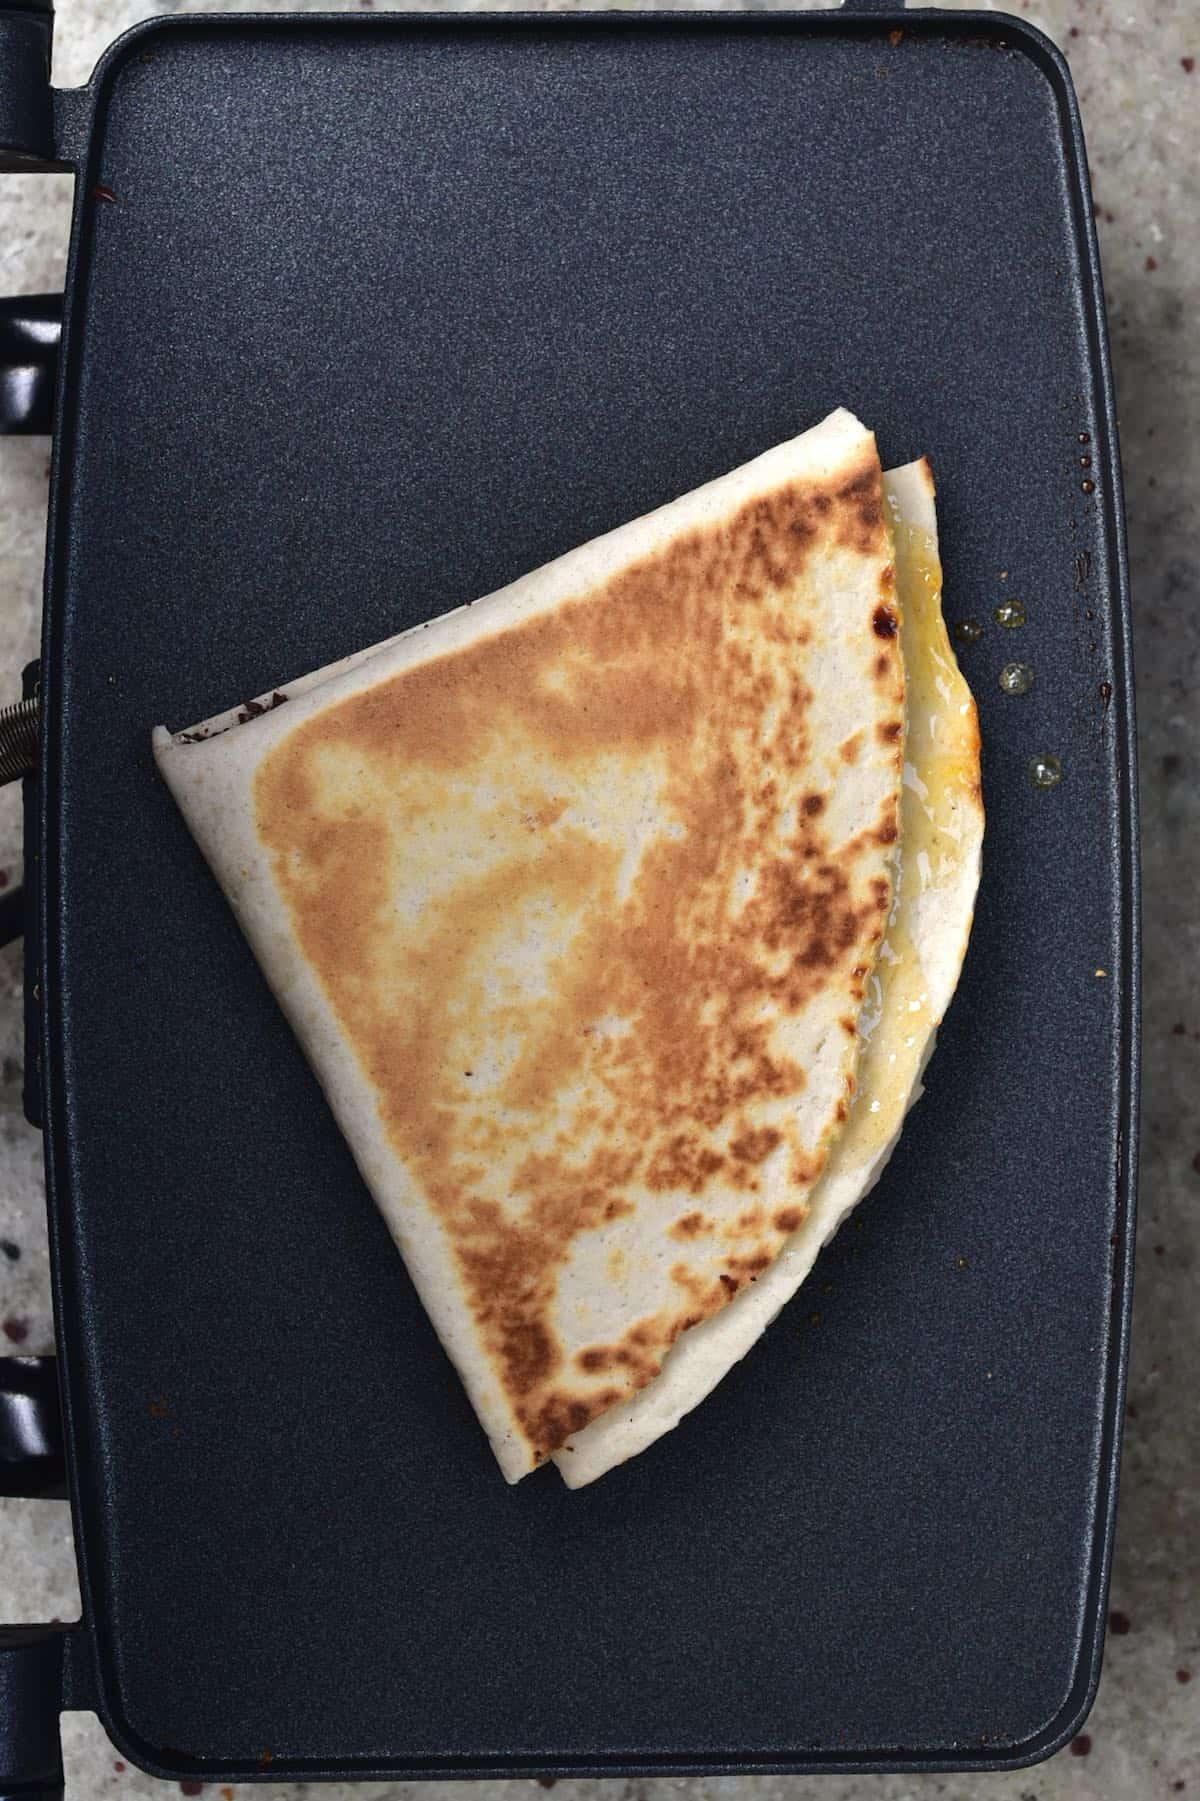 Tortilla being warmed up on a sandwich press